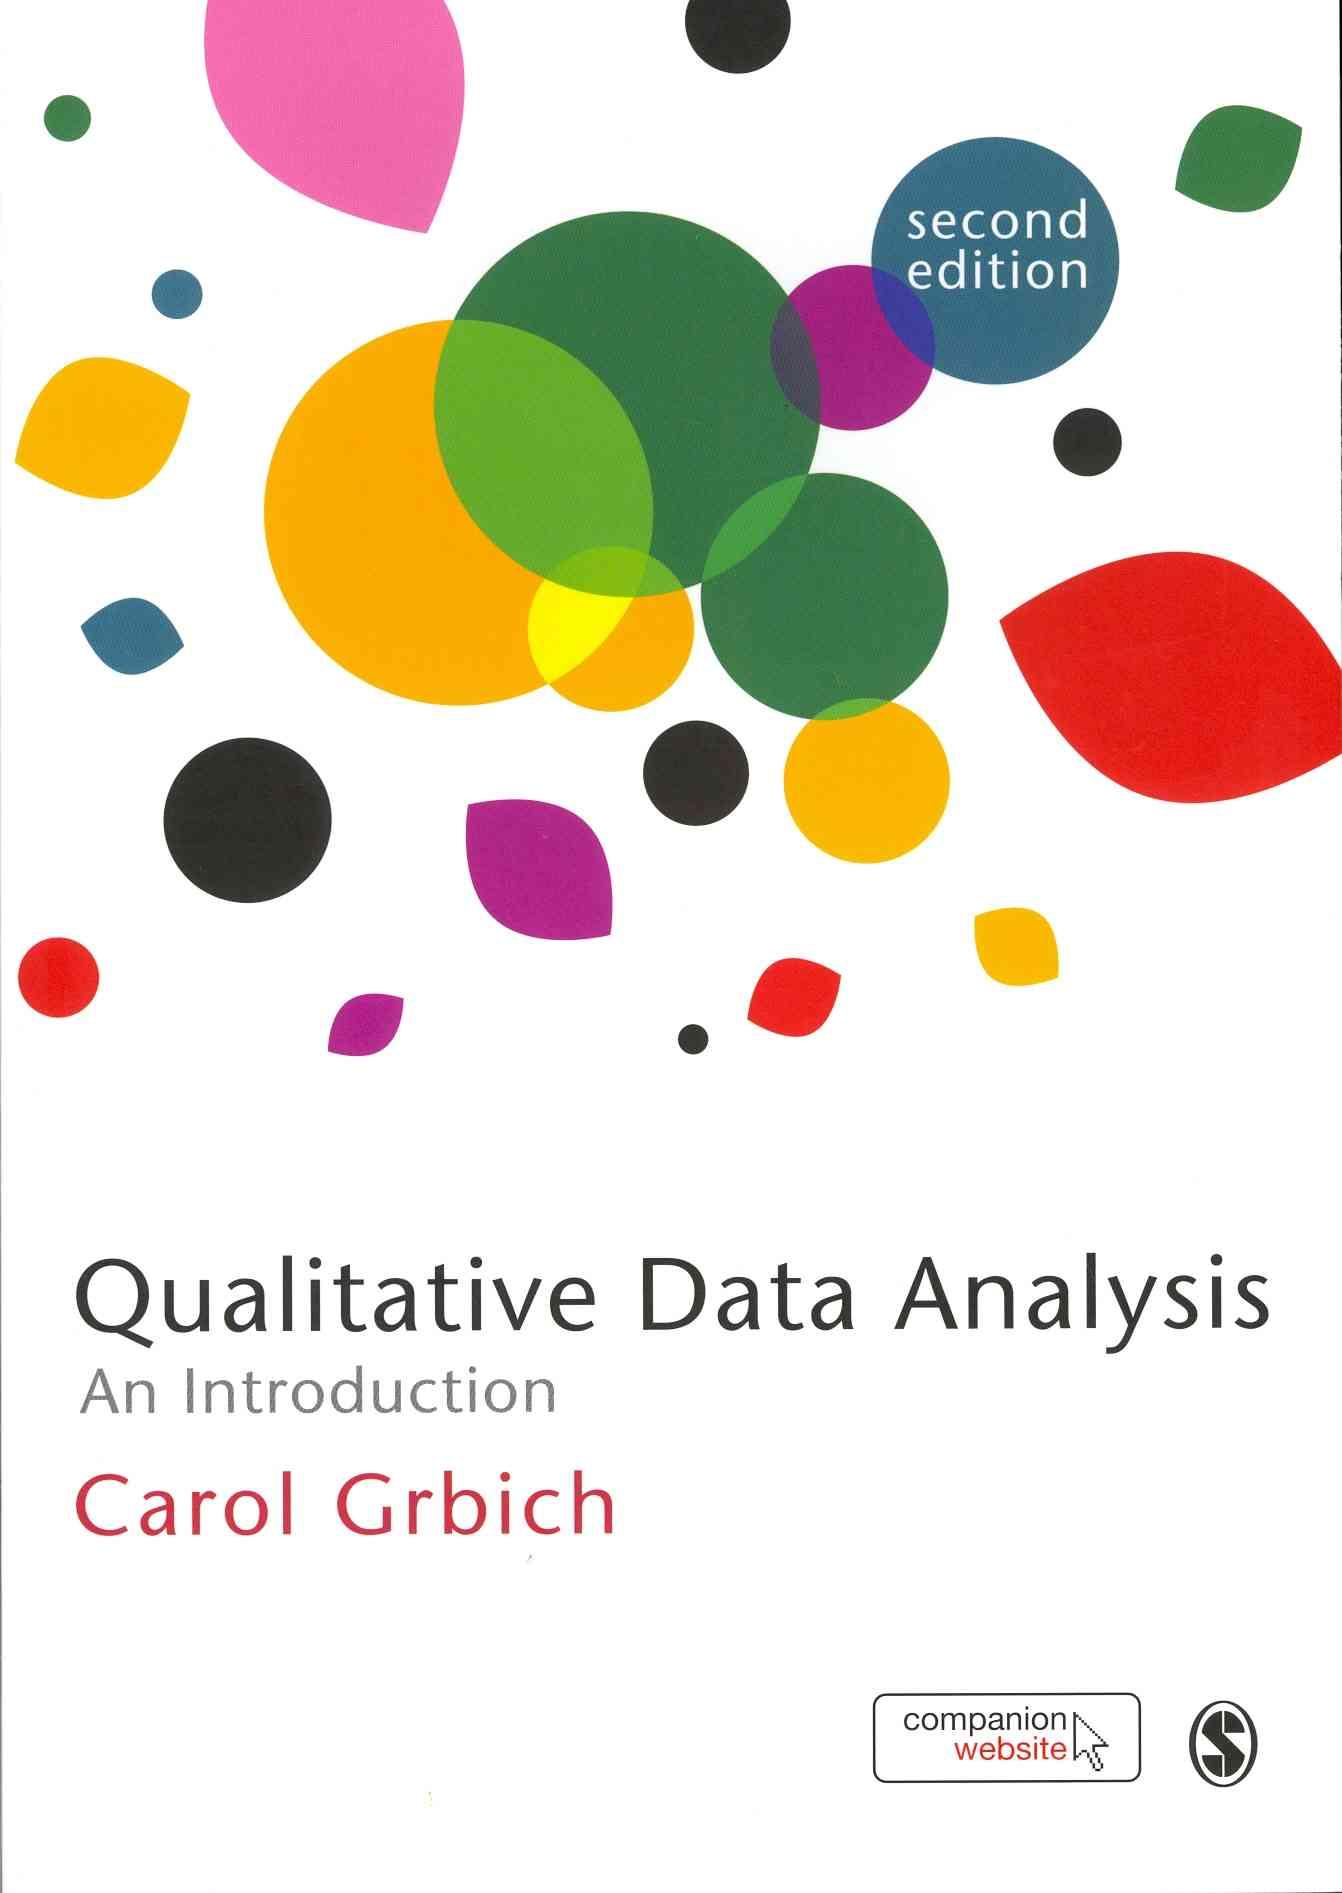 Qualitative Data Analysis By Grbich, Carol